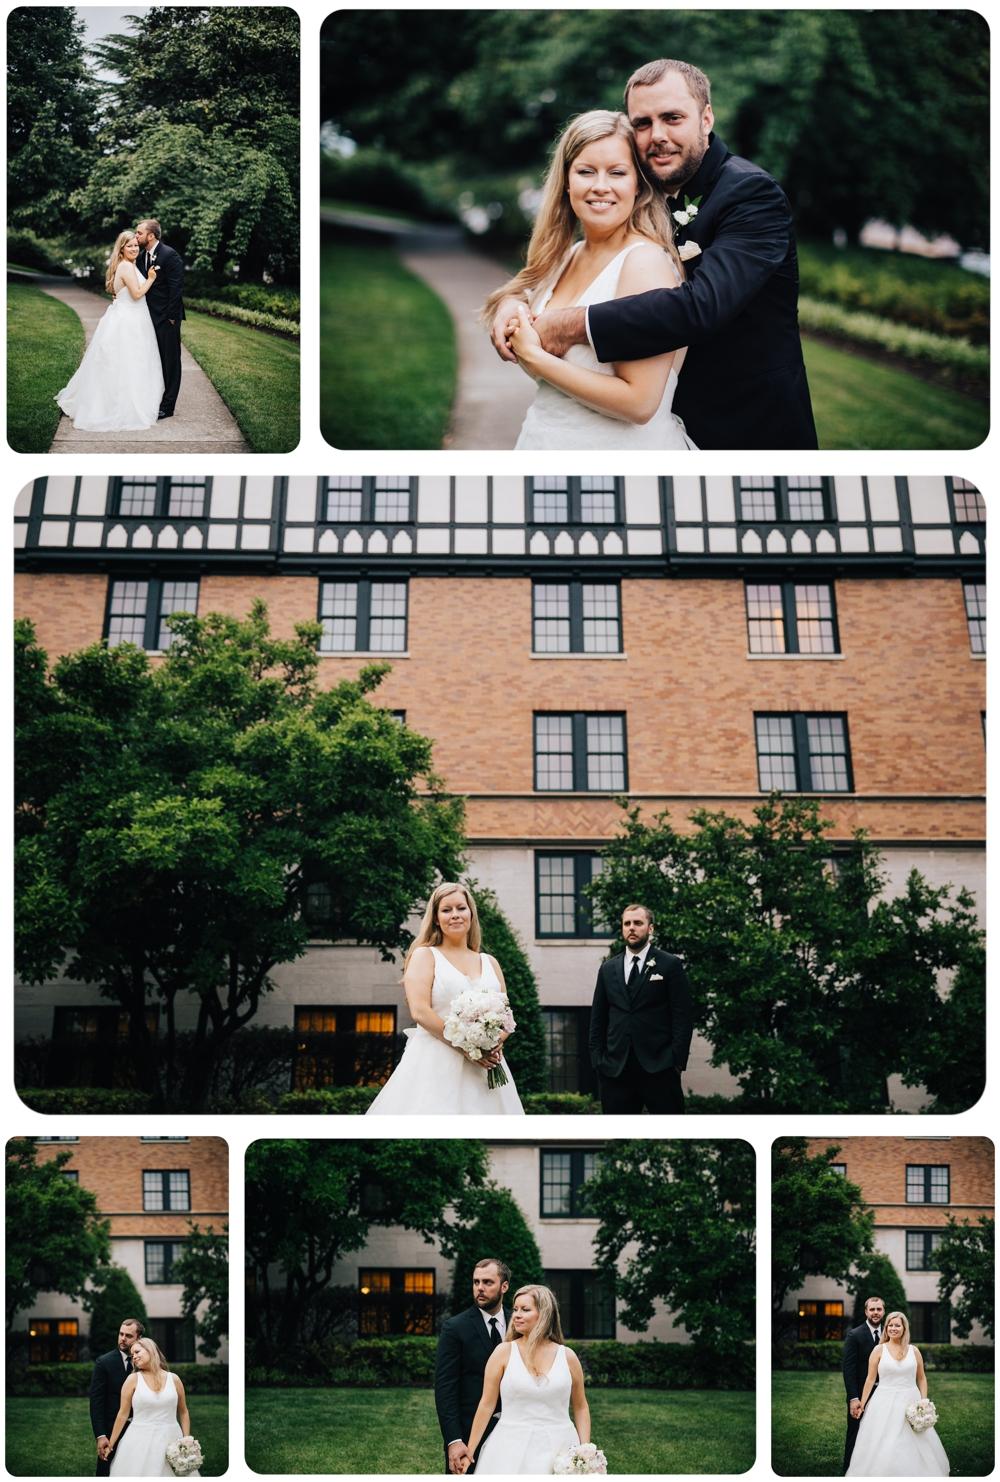 Margaret-Jon-Collage-13.jpg